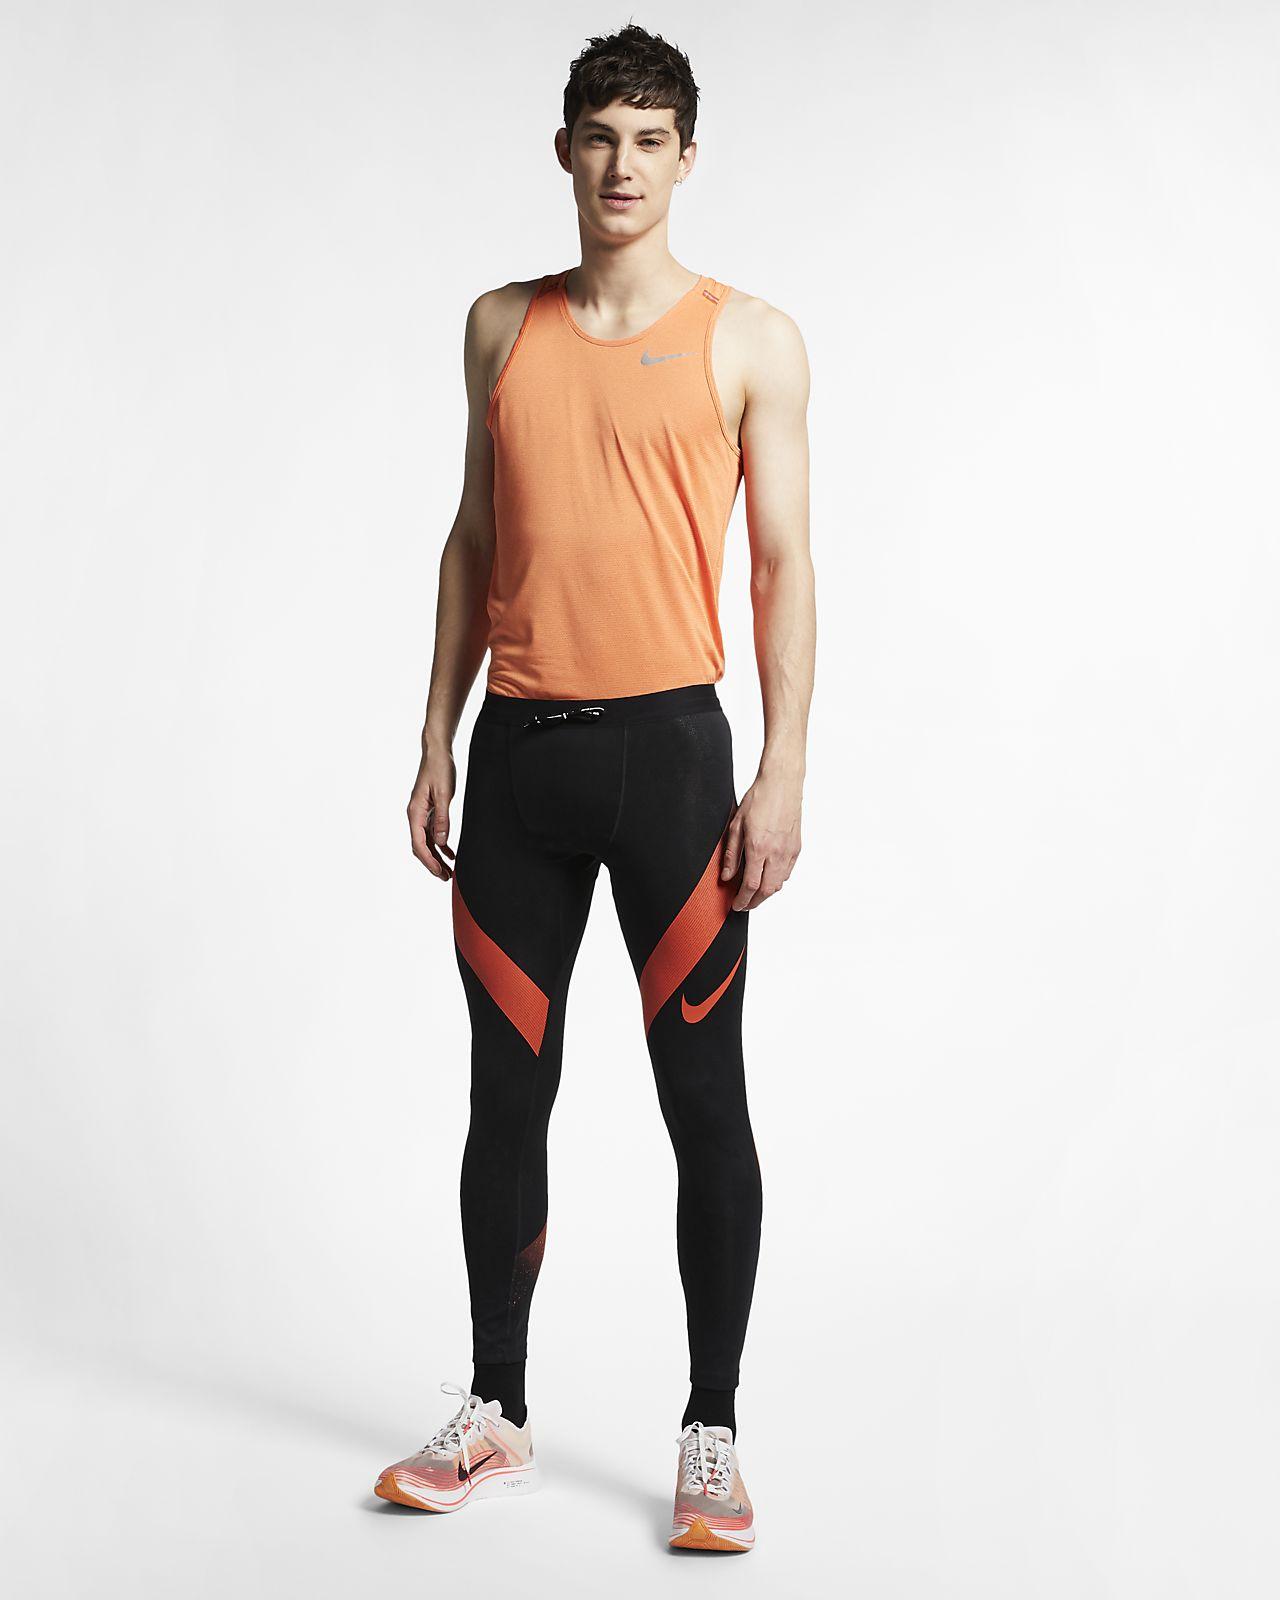 2a2db6239122a Nike Power Tech Men's Running Tights